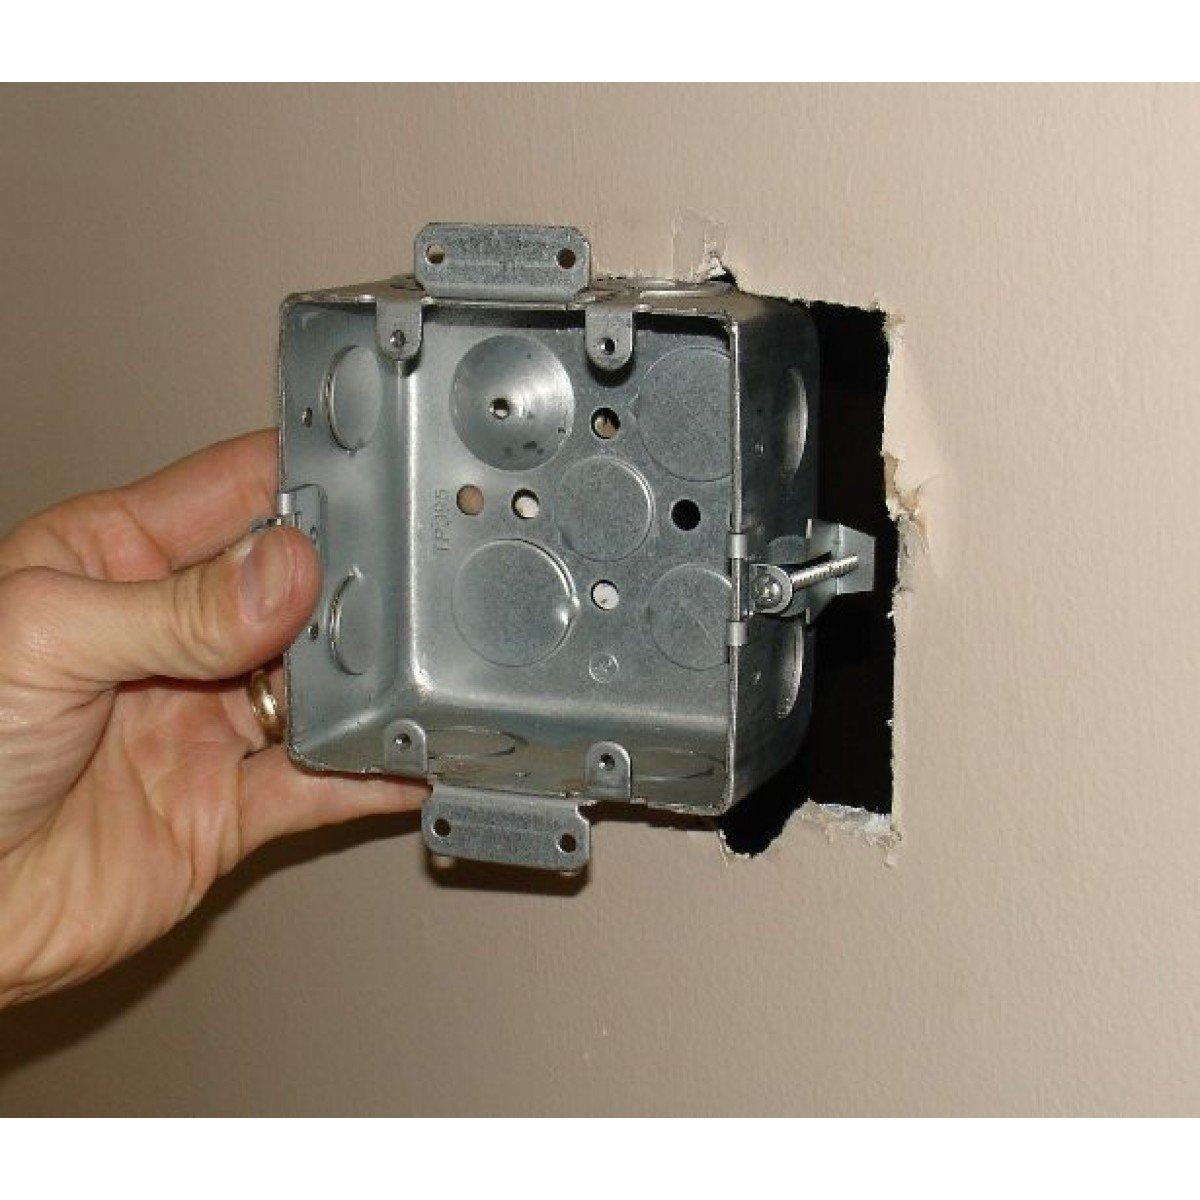 1 Pc, 2-1/8 In. Deep, Two Gang Multi Device Switch Box w/Plaster Ears & Old Work Clips, (4) 1/2 In. & (4) 1/2-3/4 In. Side Knockouts; (2) 1/2 In. & (2) 3/4 In Bottom, Zinc Plated Steel